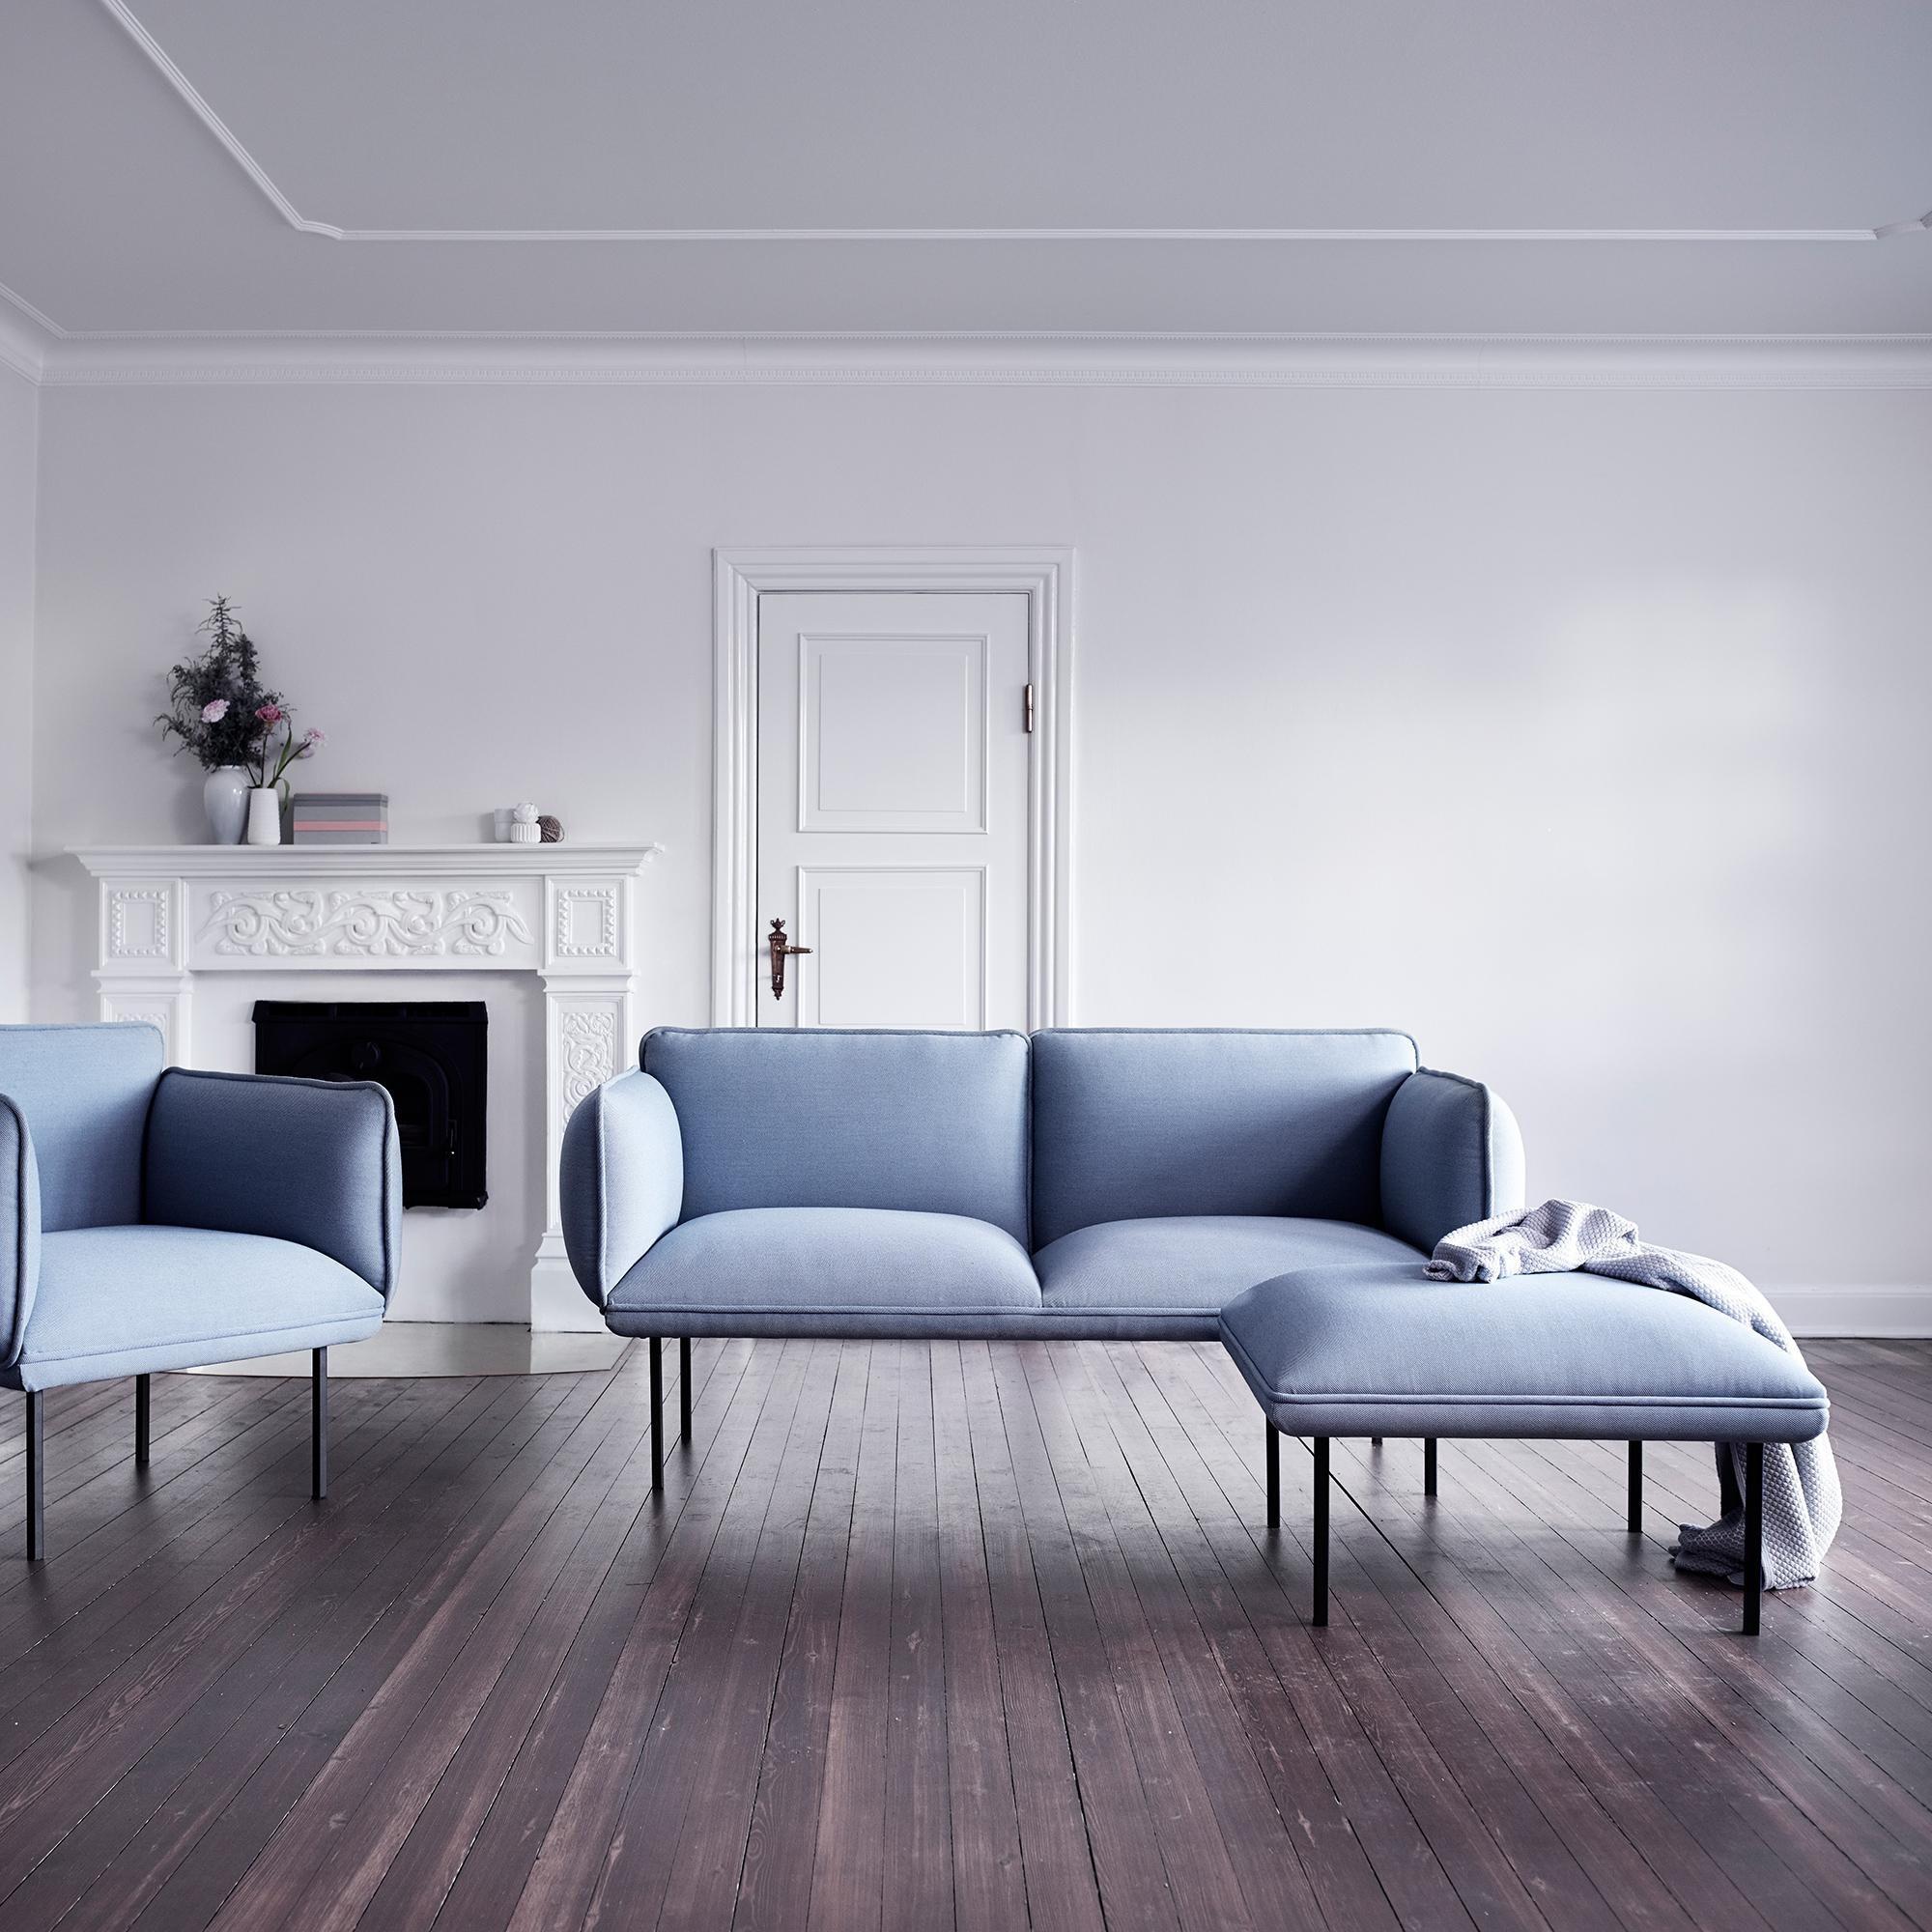 Woud Nakki 2 Seater Fabric Sofa Ambientedirect